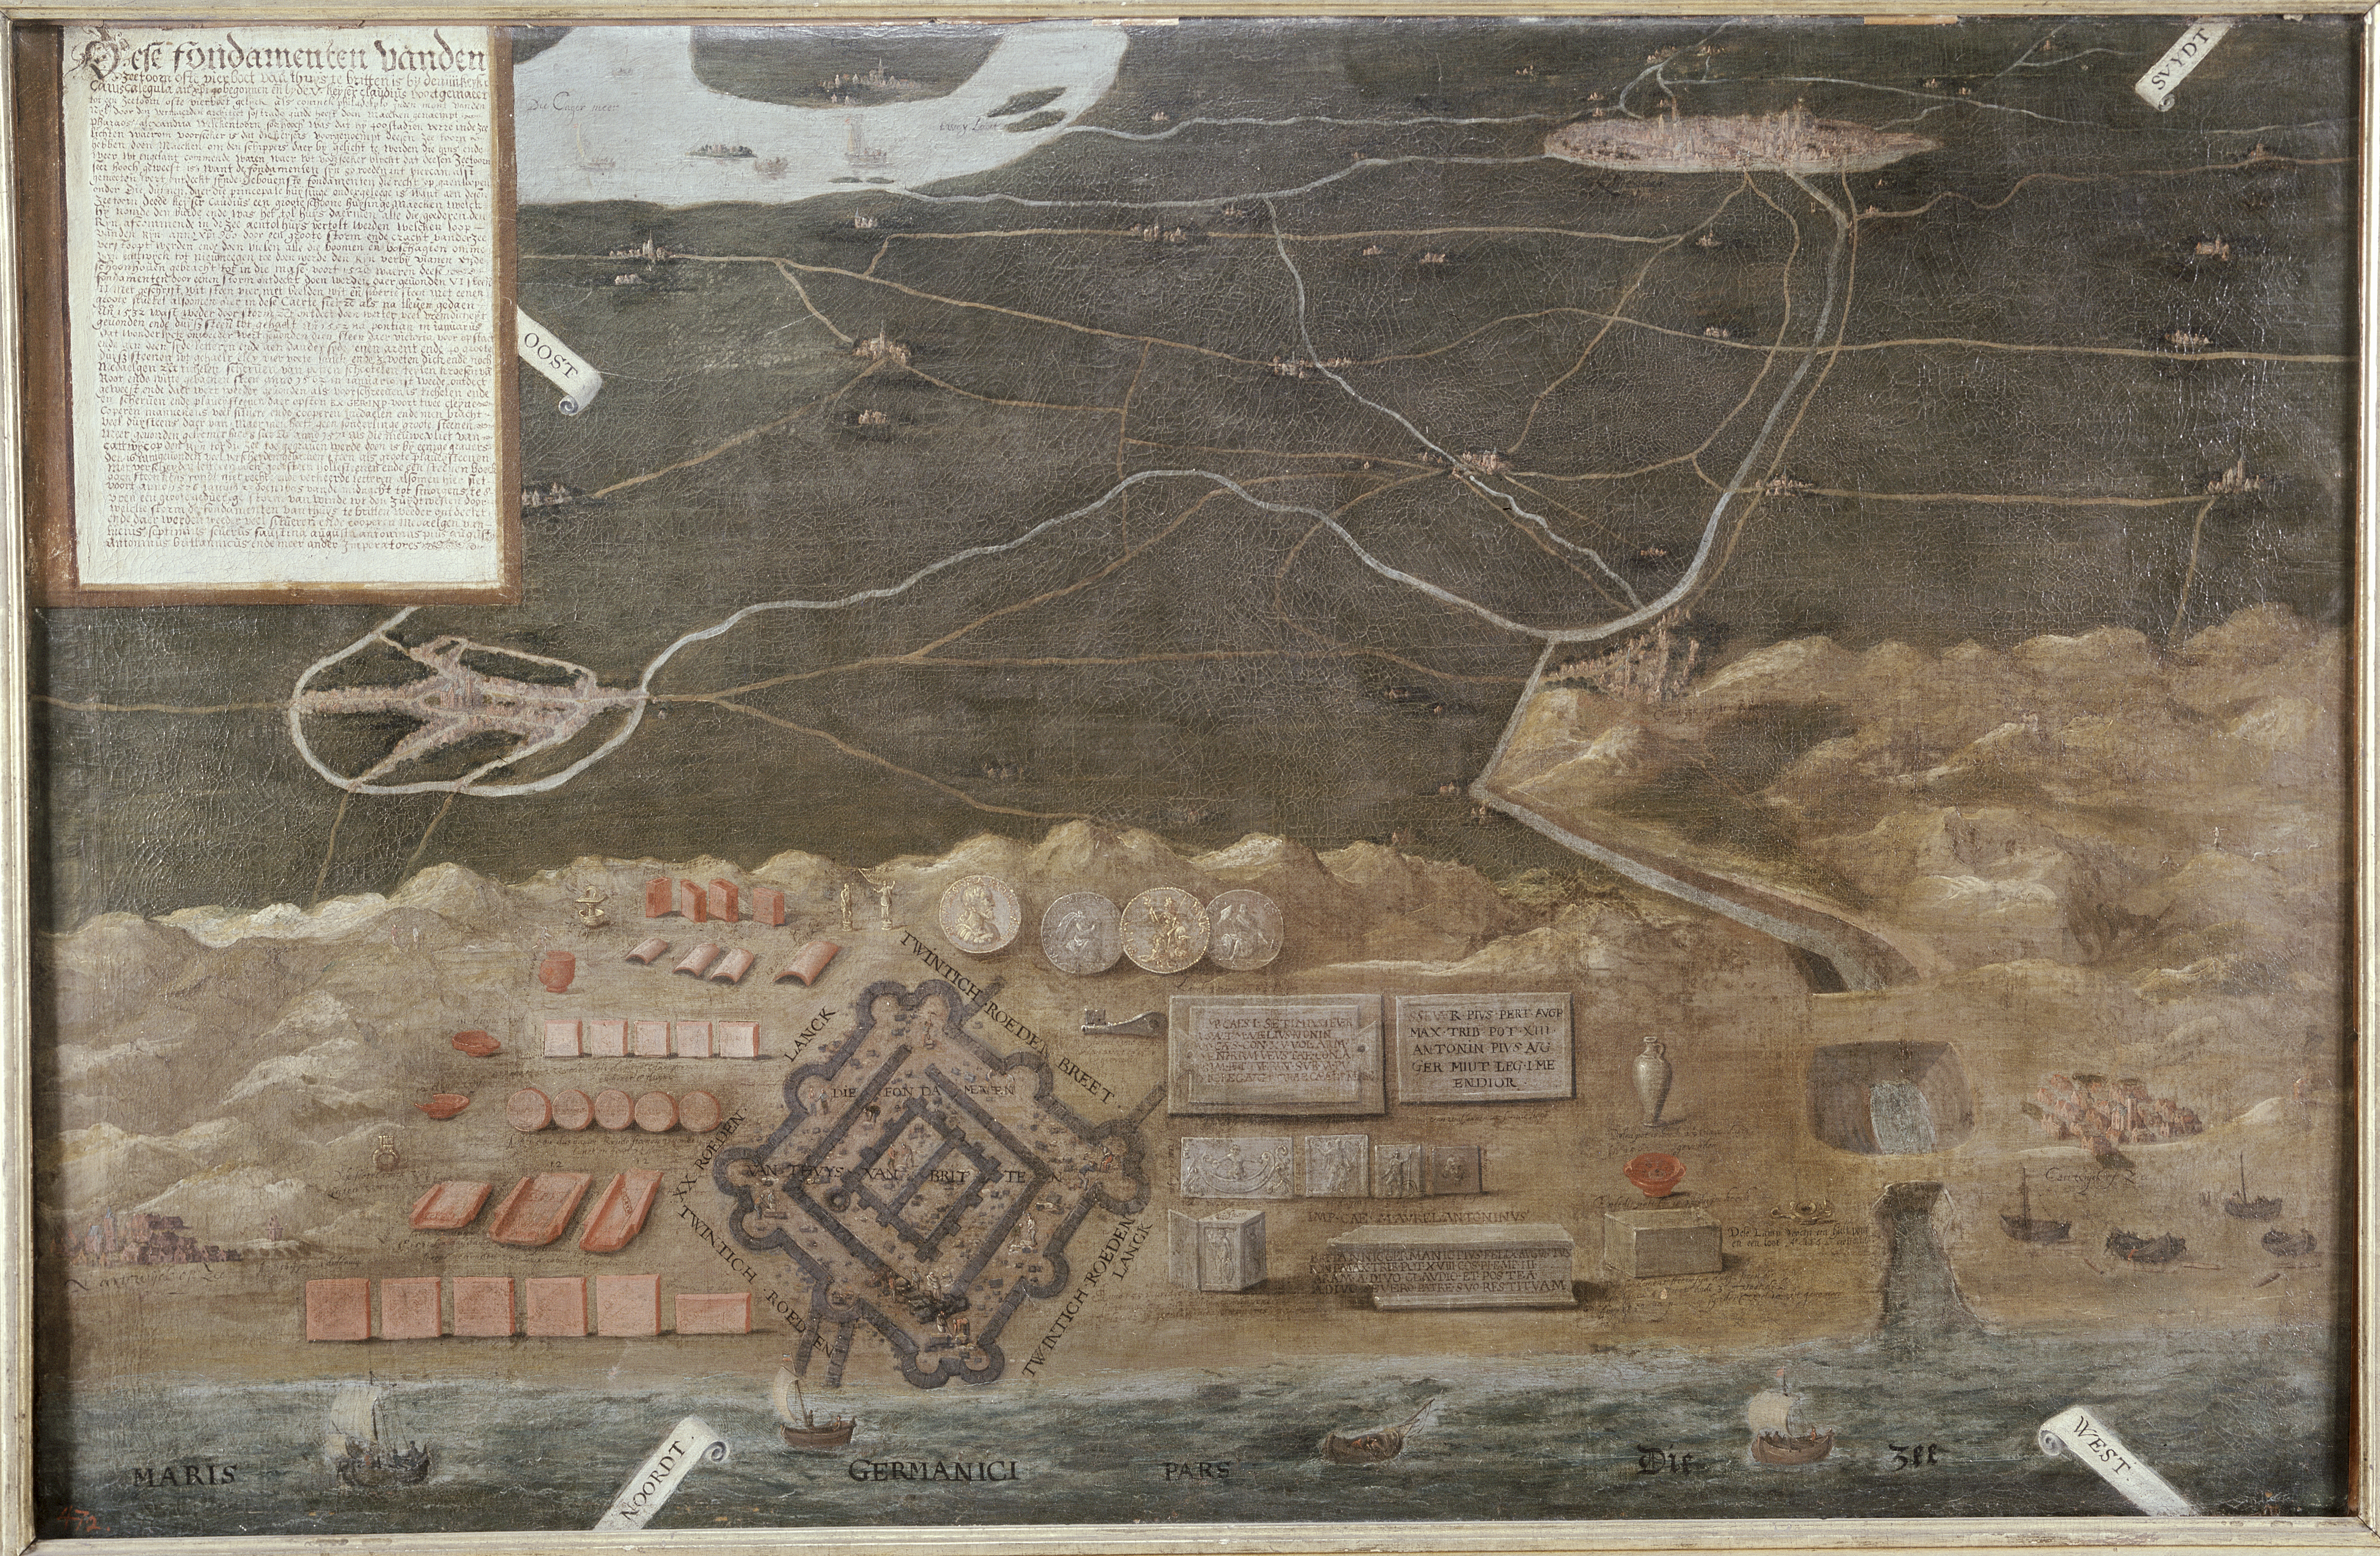 File:Schilderij Brittenburg Katwijk RMO Leiden.jpg - Wikimedia Commons